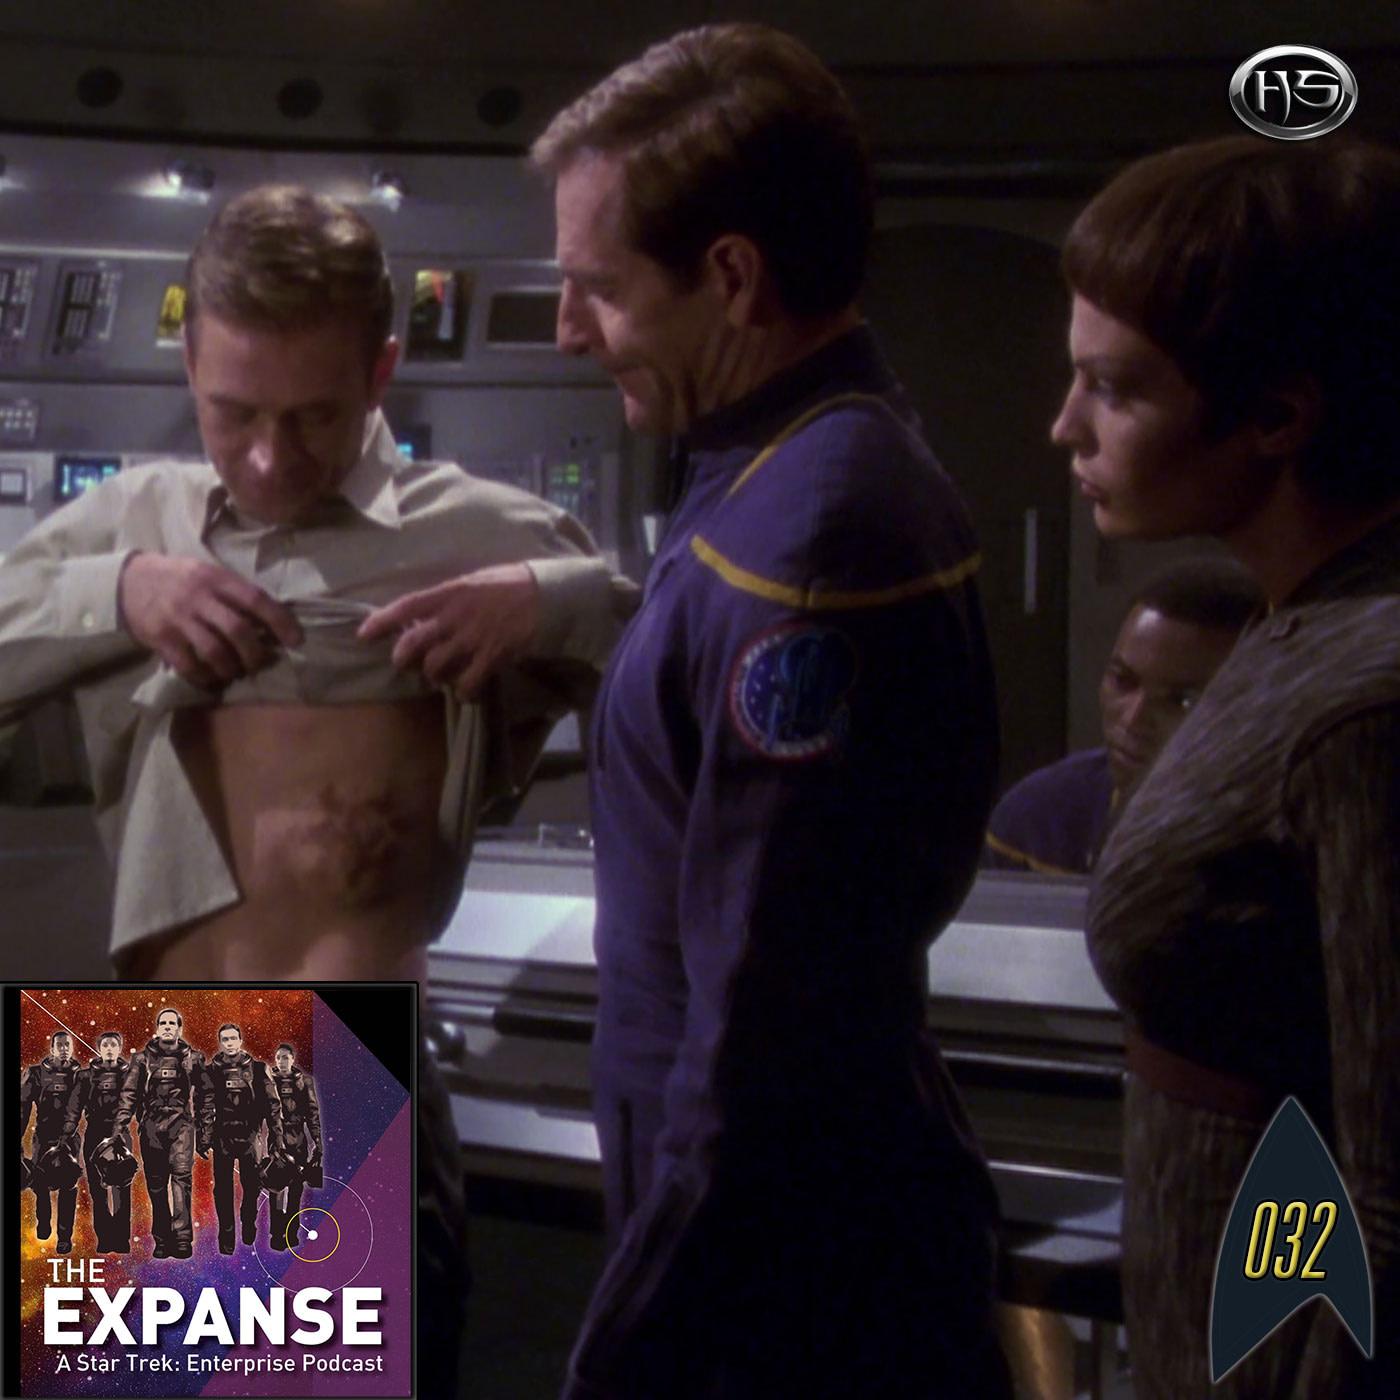 The Expanse Episode 32